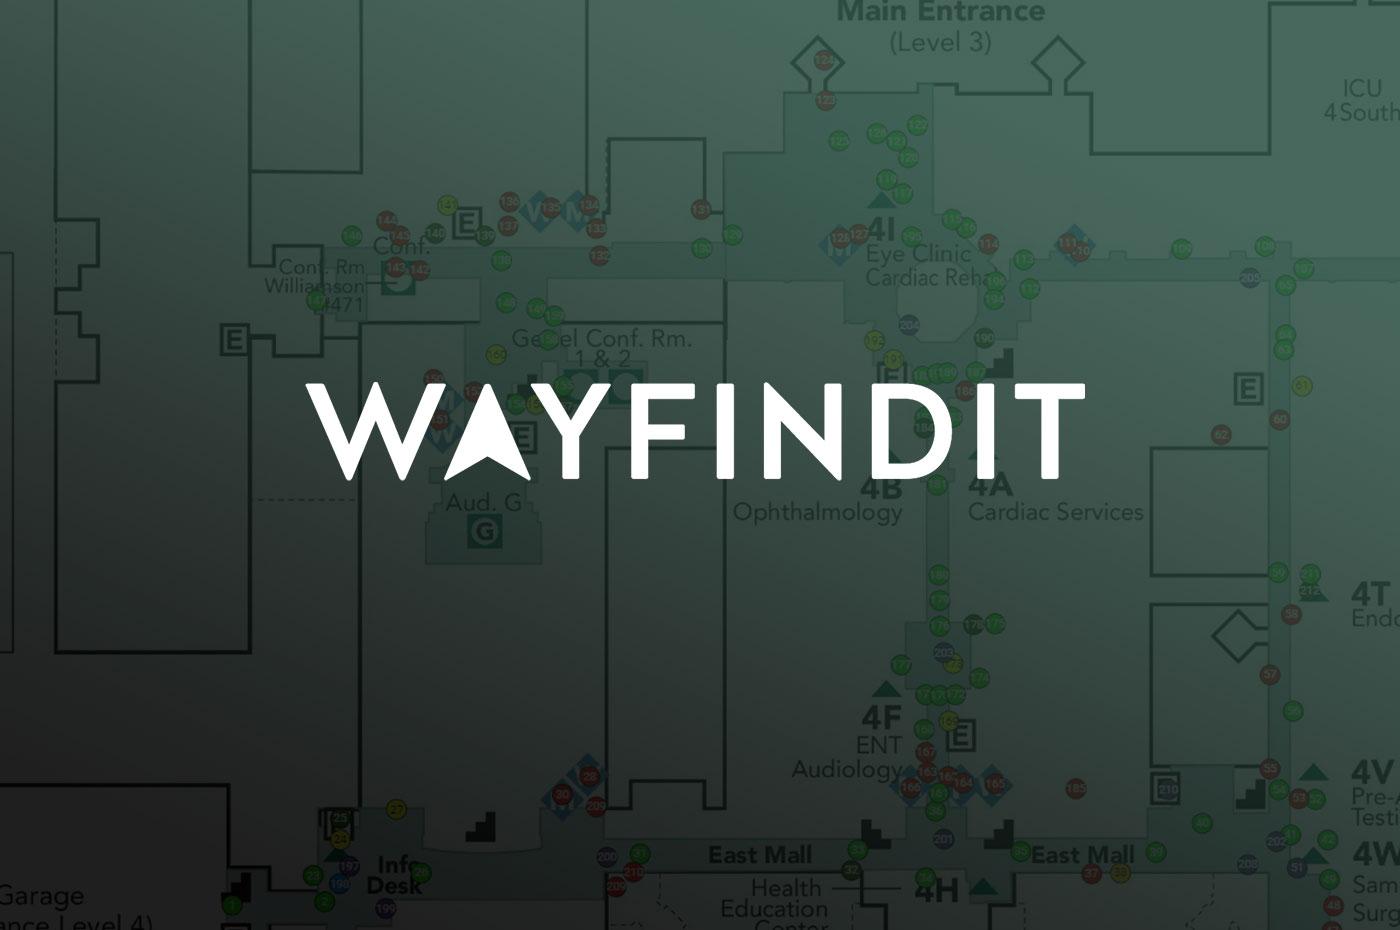 wayfindit software benefits